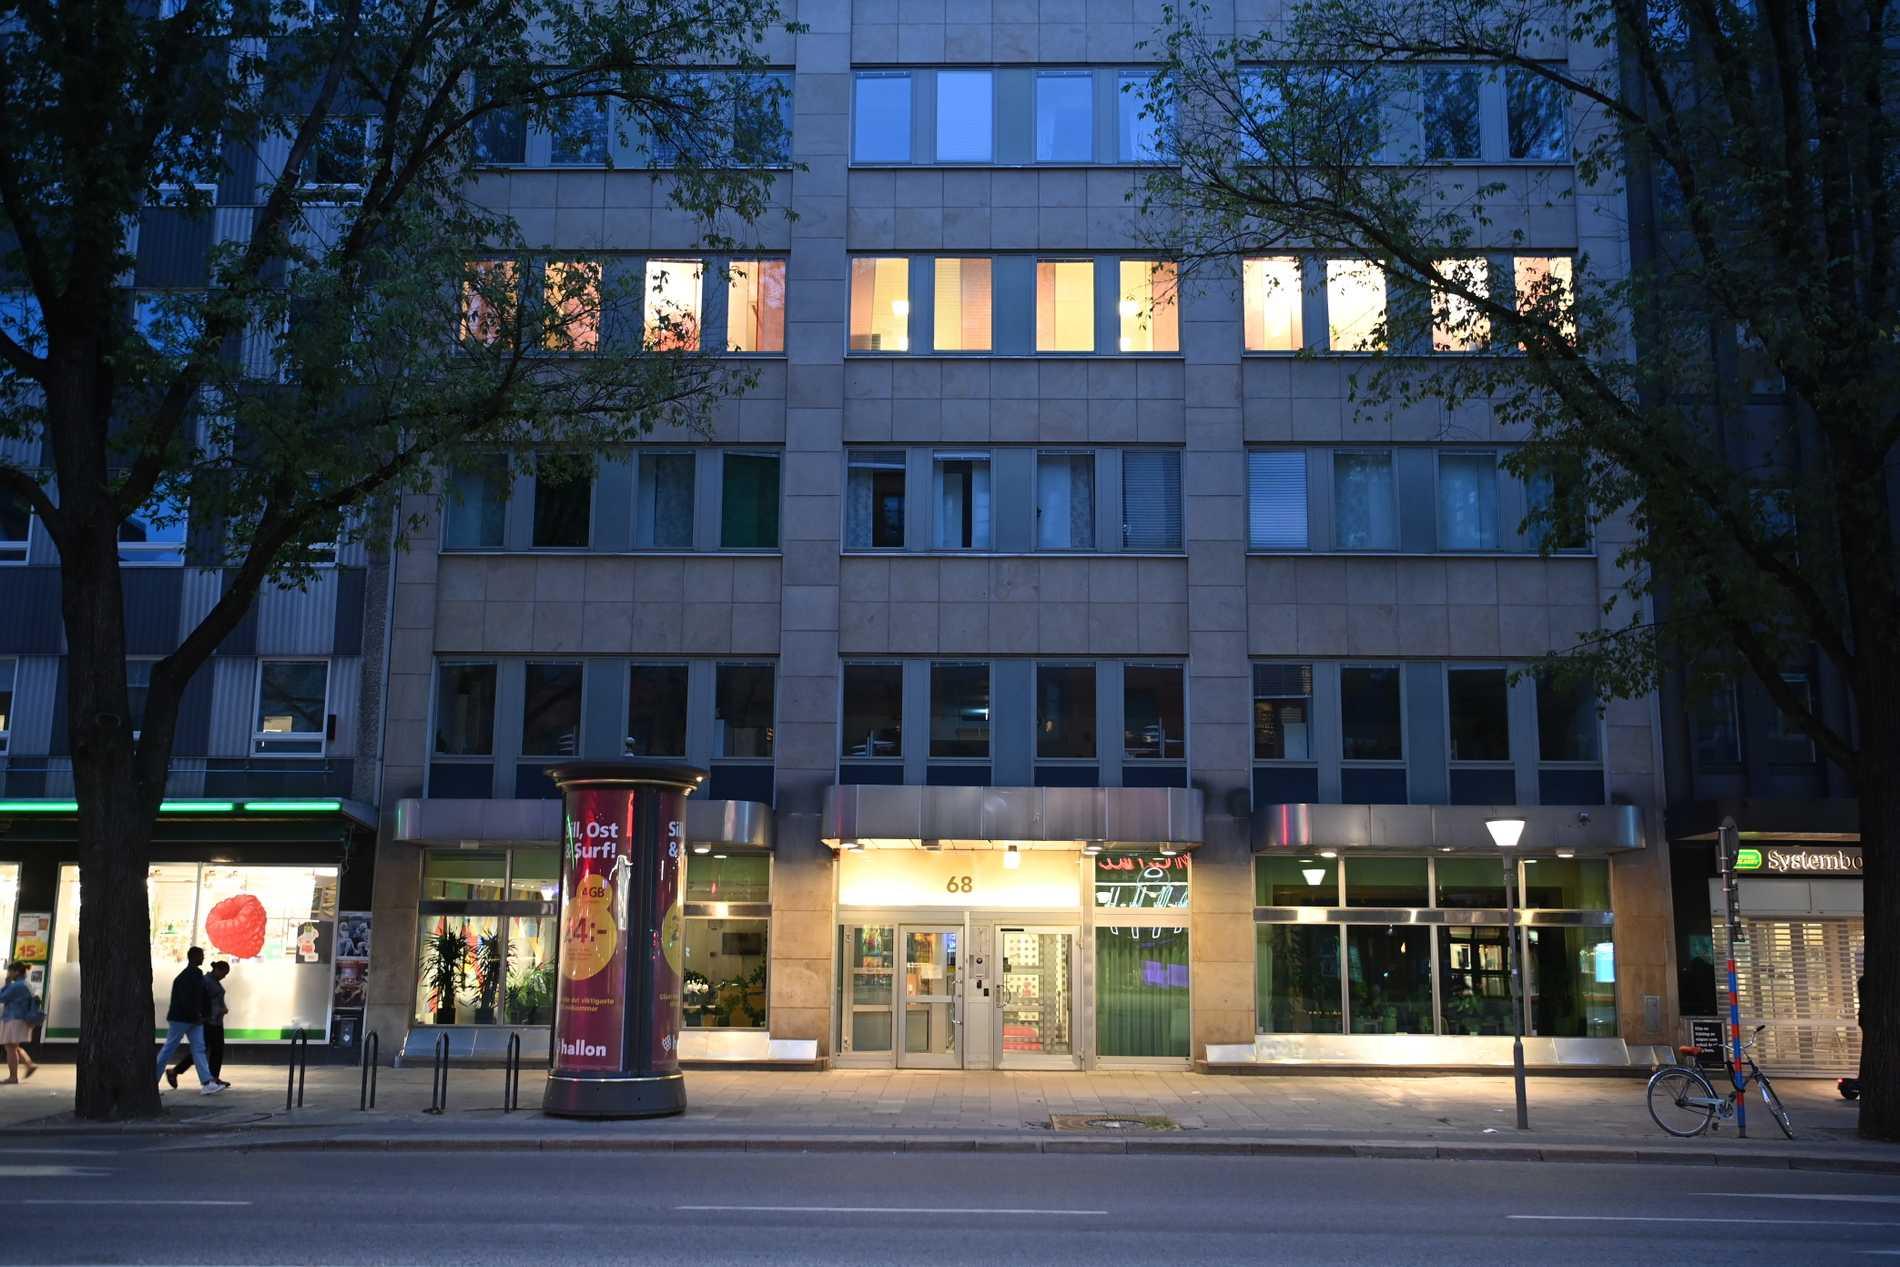 S-högkvarteret på Sveavägen i centrala Stockholm.